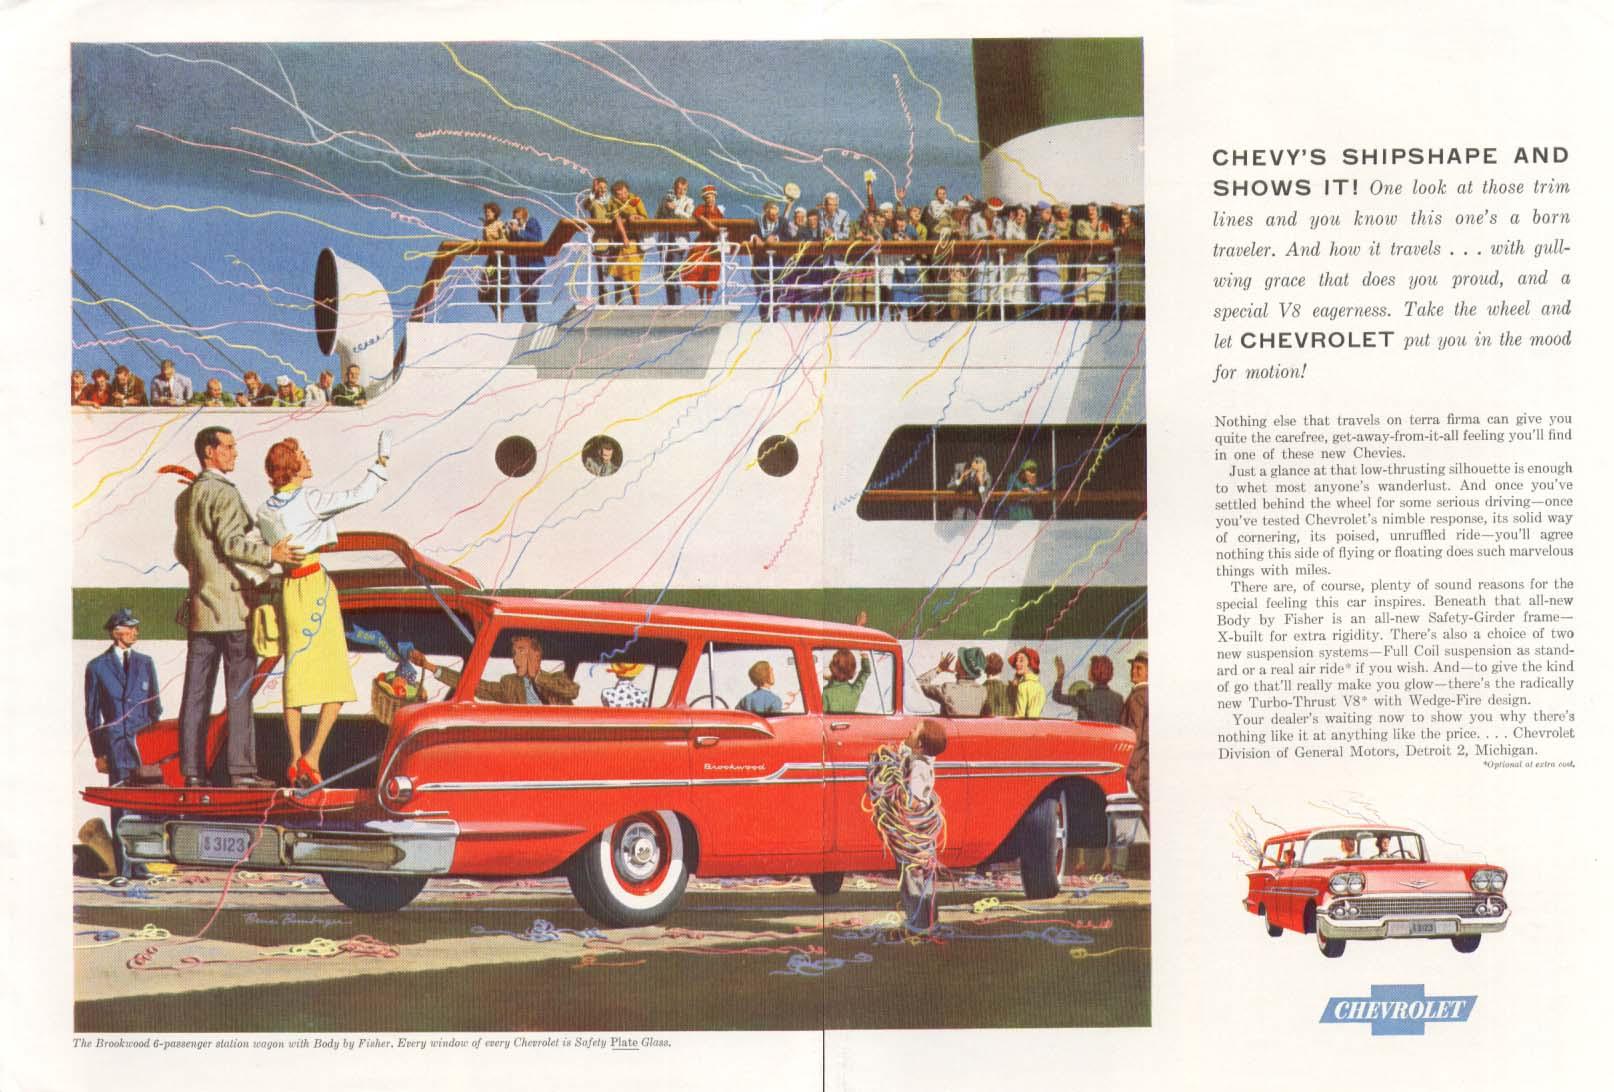 Chevrolet Brookwood station wagon Shipshape ad 1958